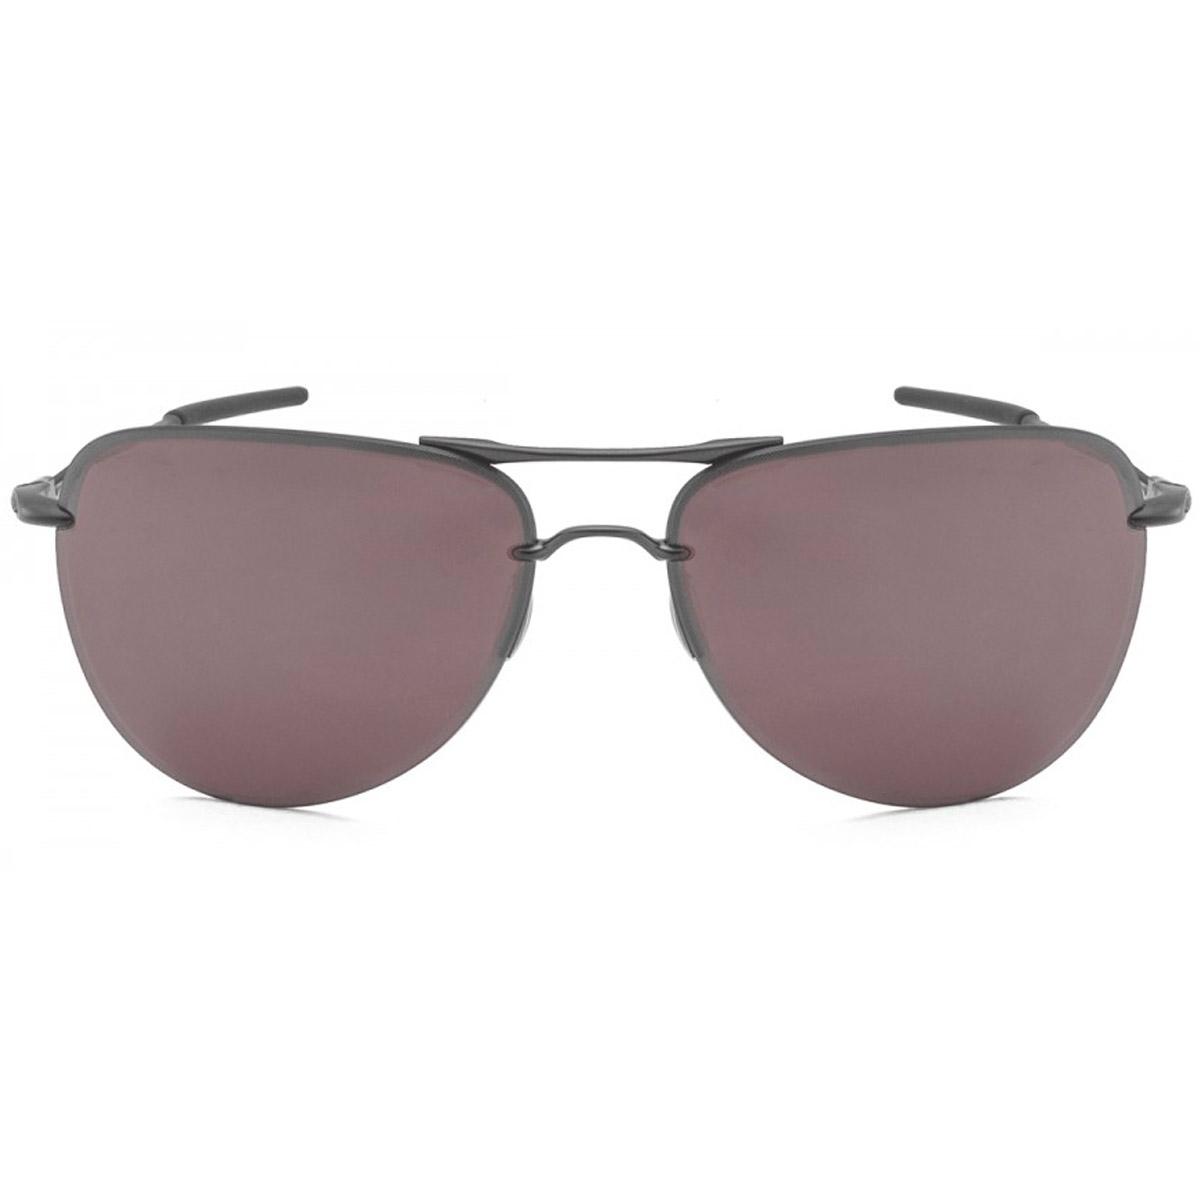 Óculos Oakley Tailpin Carbom Lente Prizm Daily Polarizado ref OO4086-04 e0750d9940